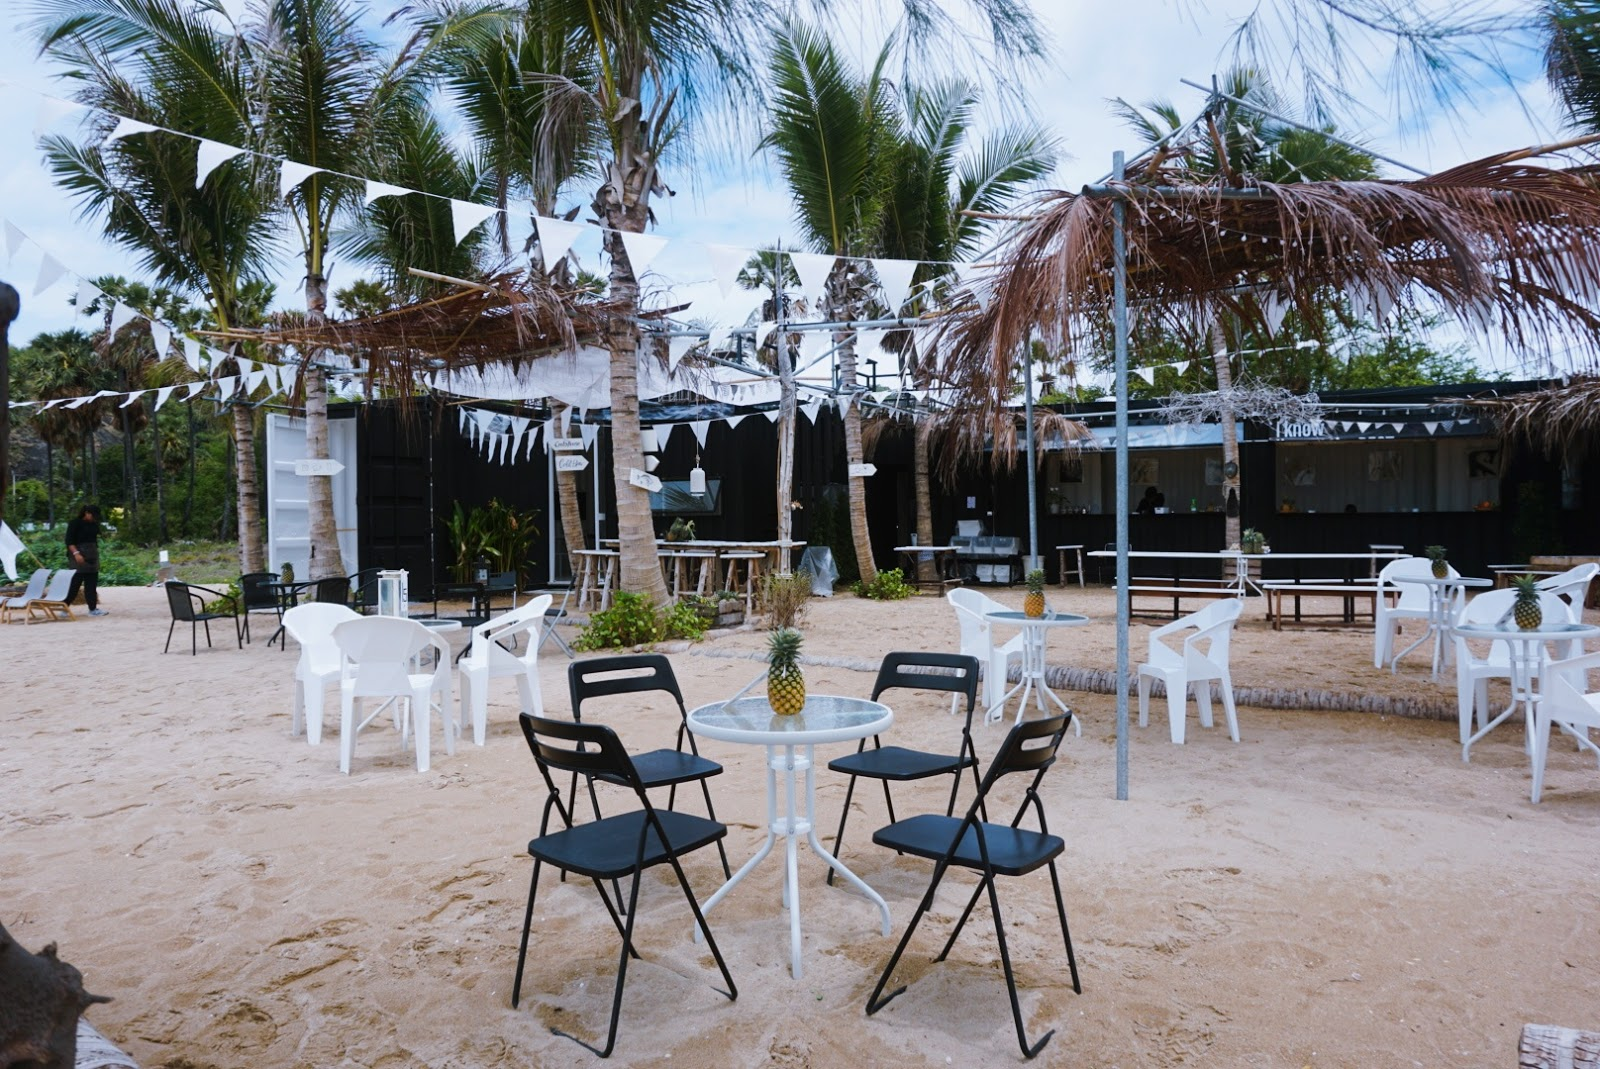 1d+Day Artist Cafe คาเฟ่สไตล์มินิมอลติดริมทะเล